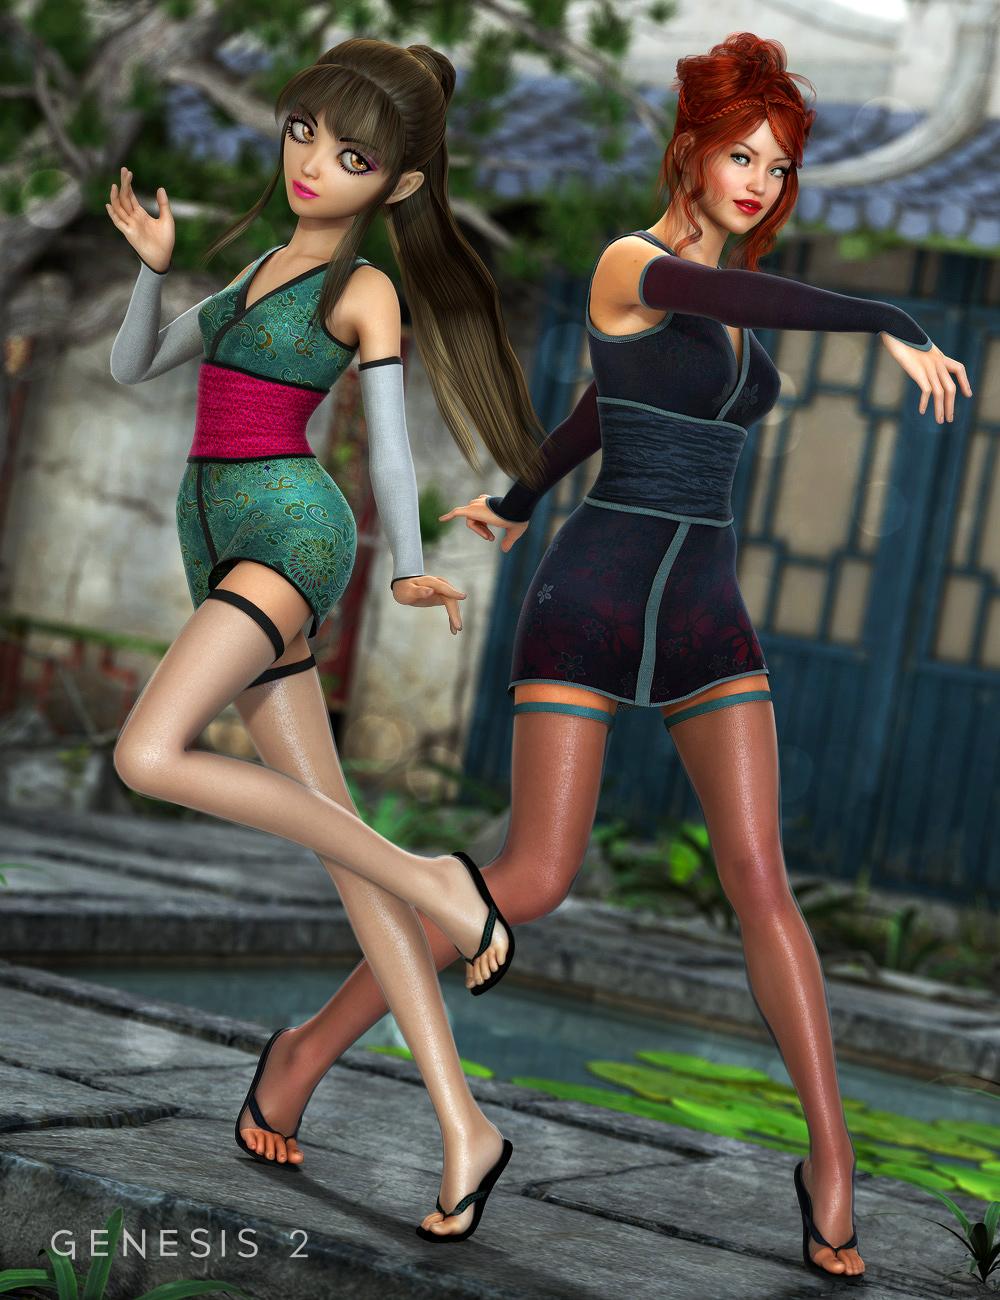 Shinobi Shozoku Textures by: Sarsa, 3D Models by Daz 3D